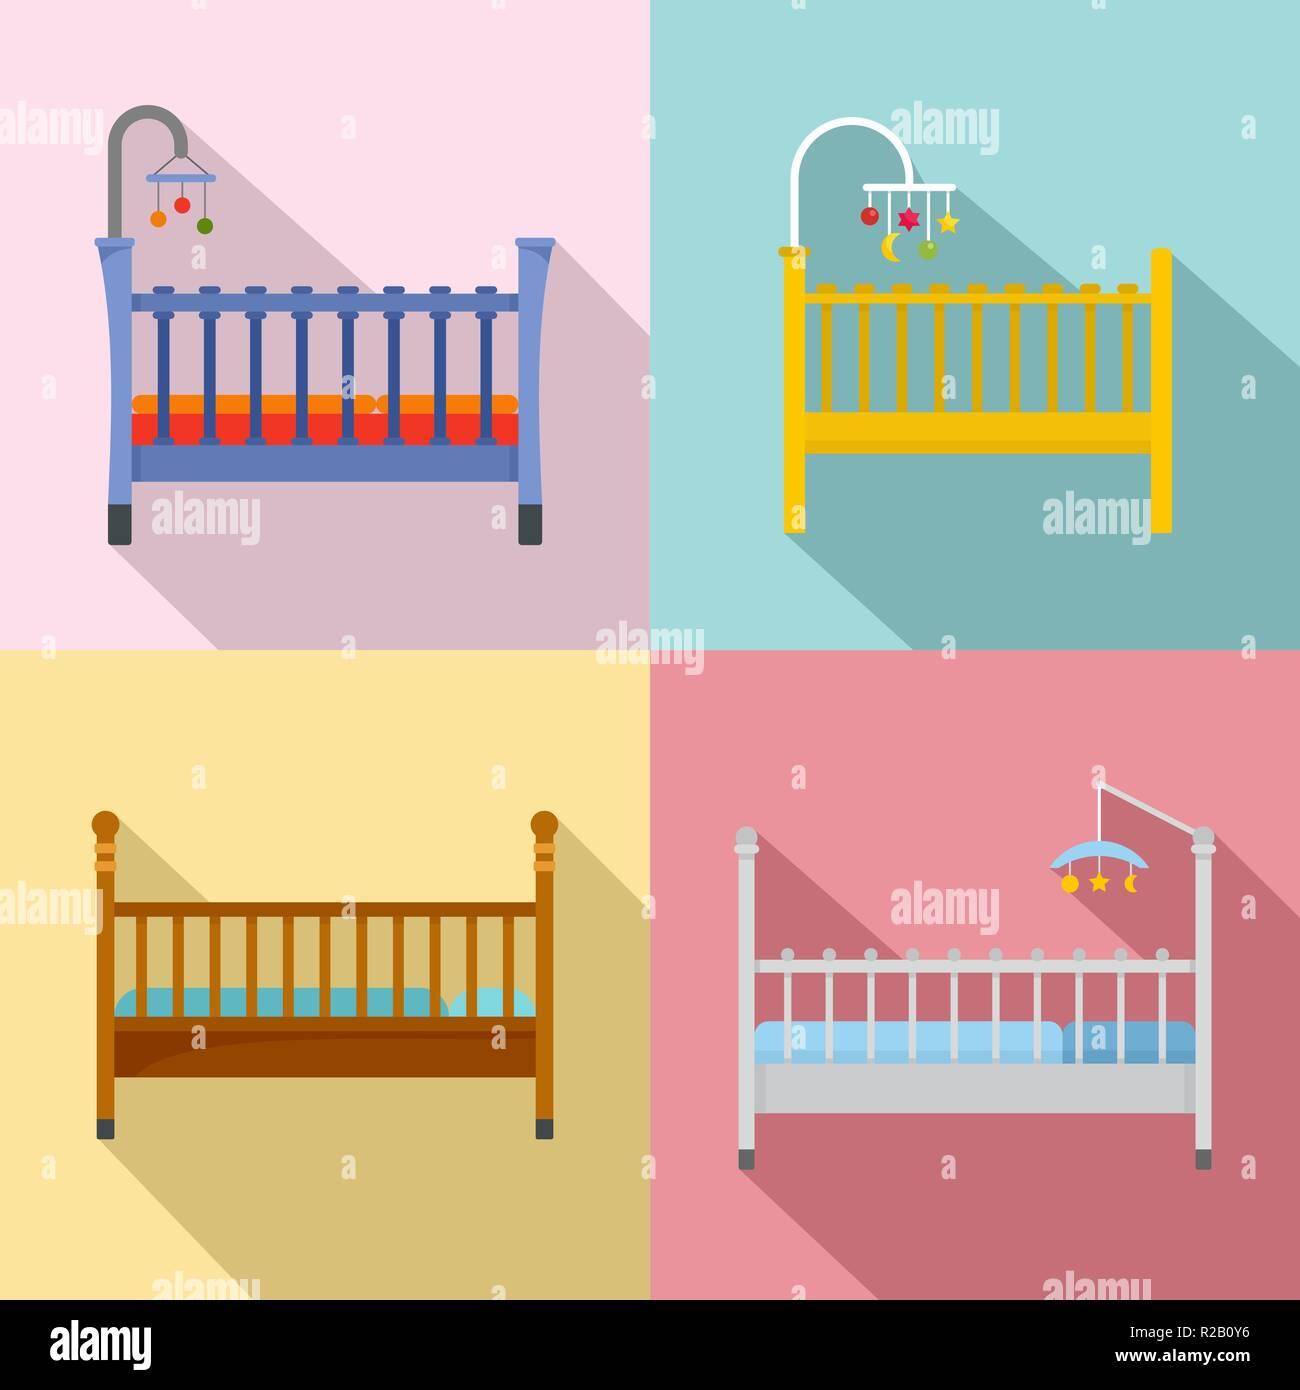 Baby Crib Cradle Bed Icons Set Flat Illustration Of 4 Baby Crib